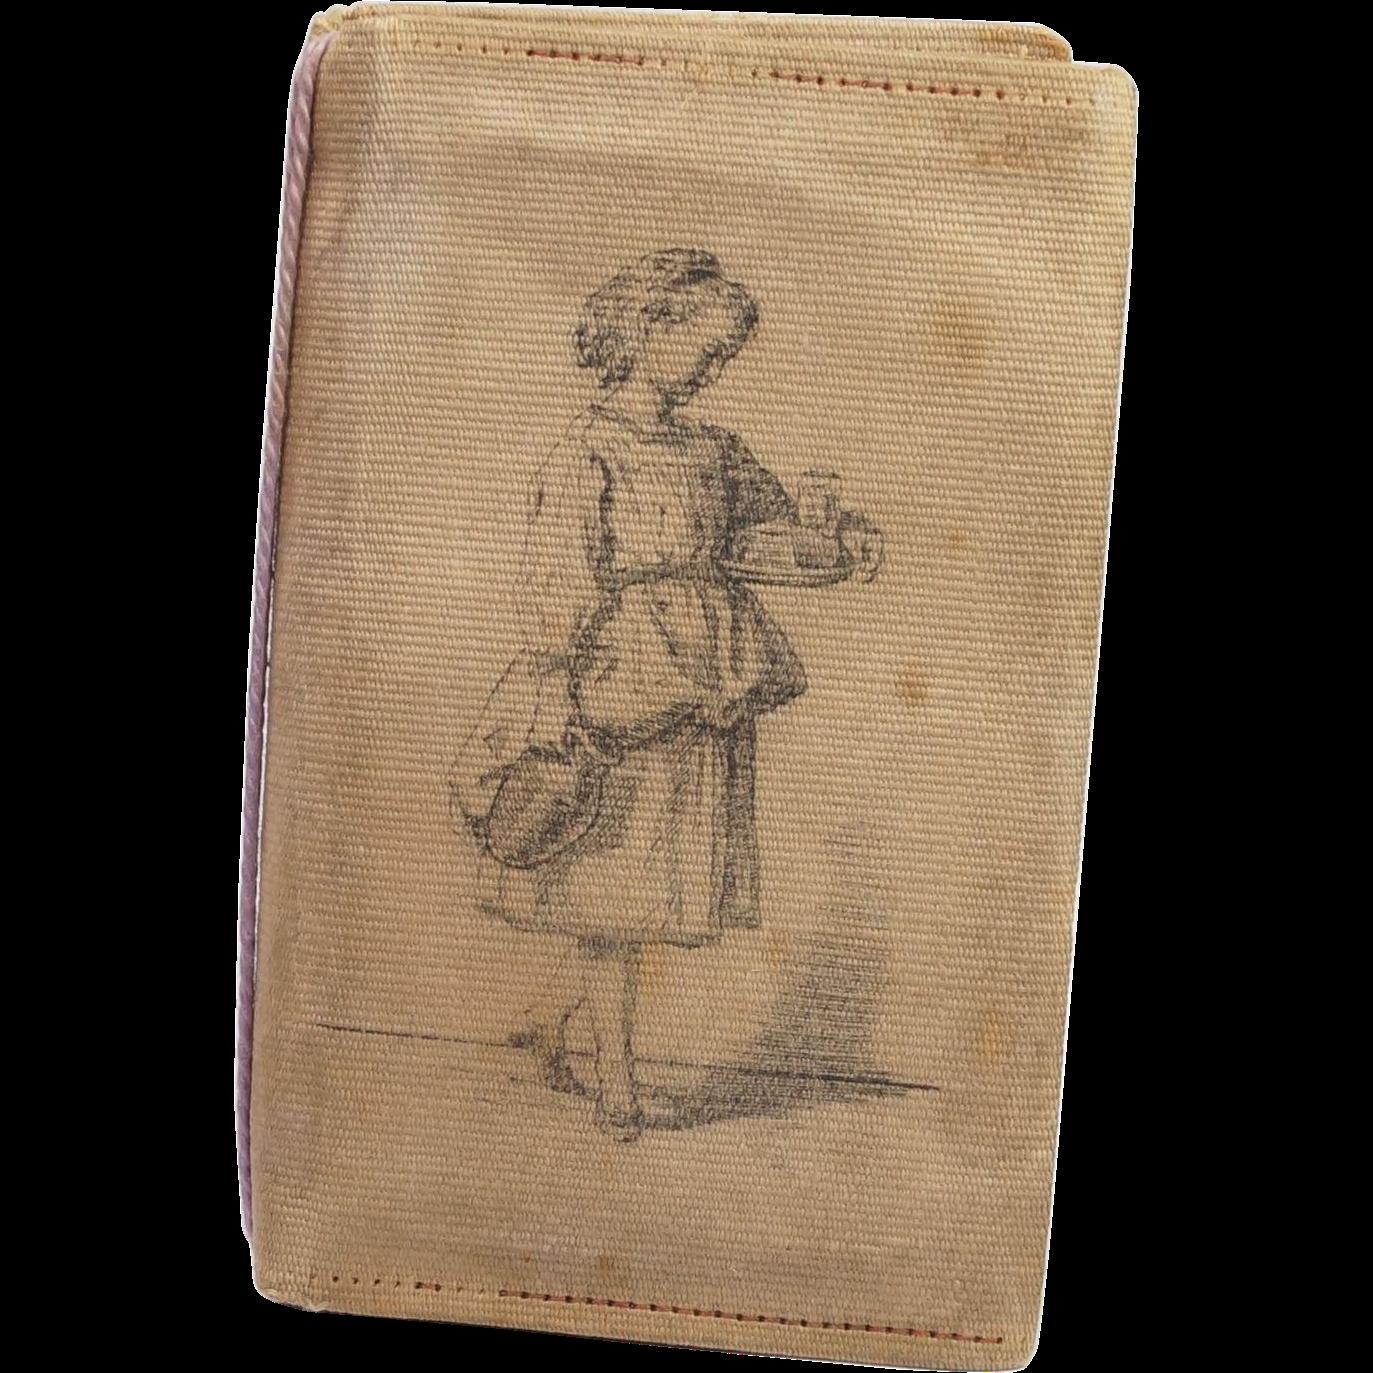 Antique Victorian Aide Memoir Note Book Rare Printed Cover English Circa 1880